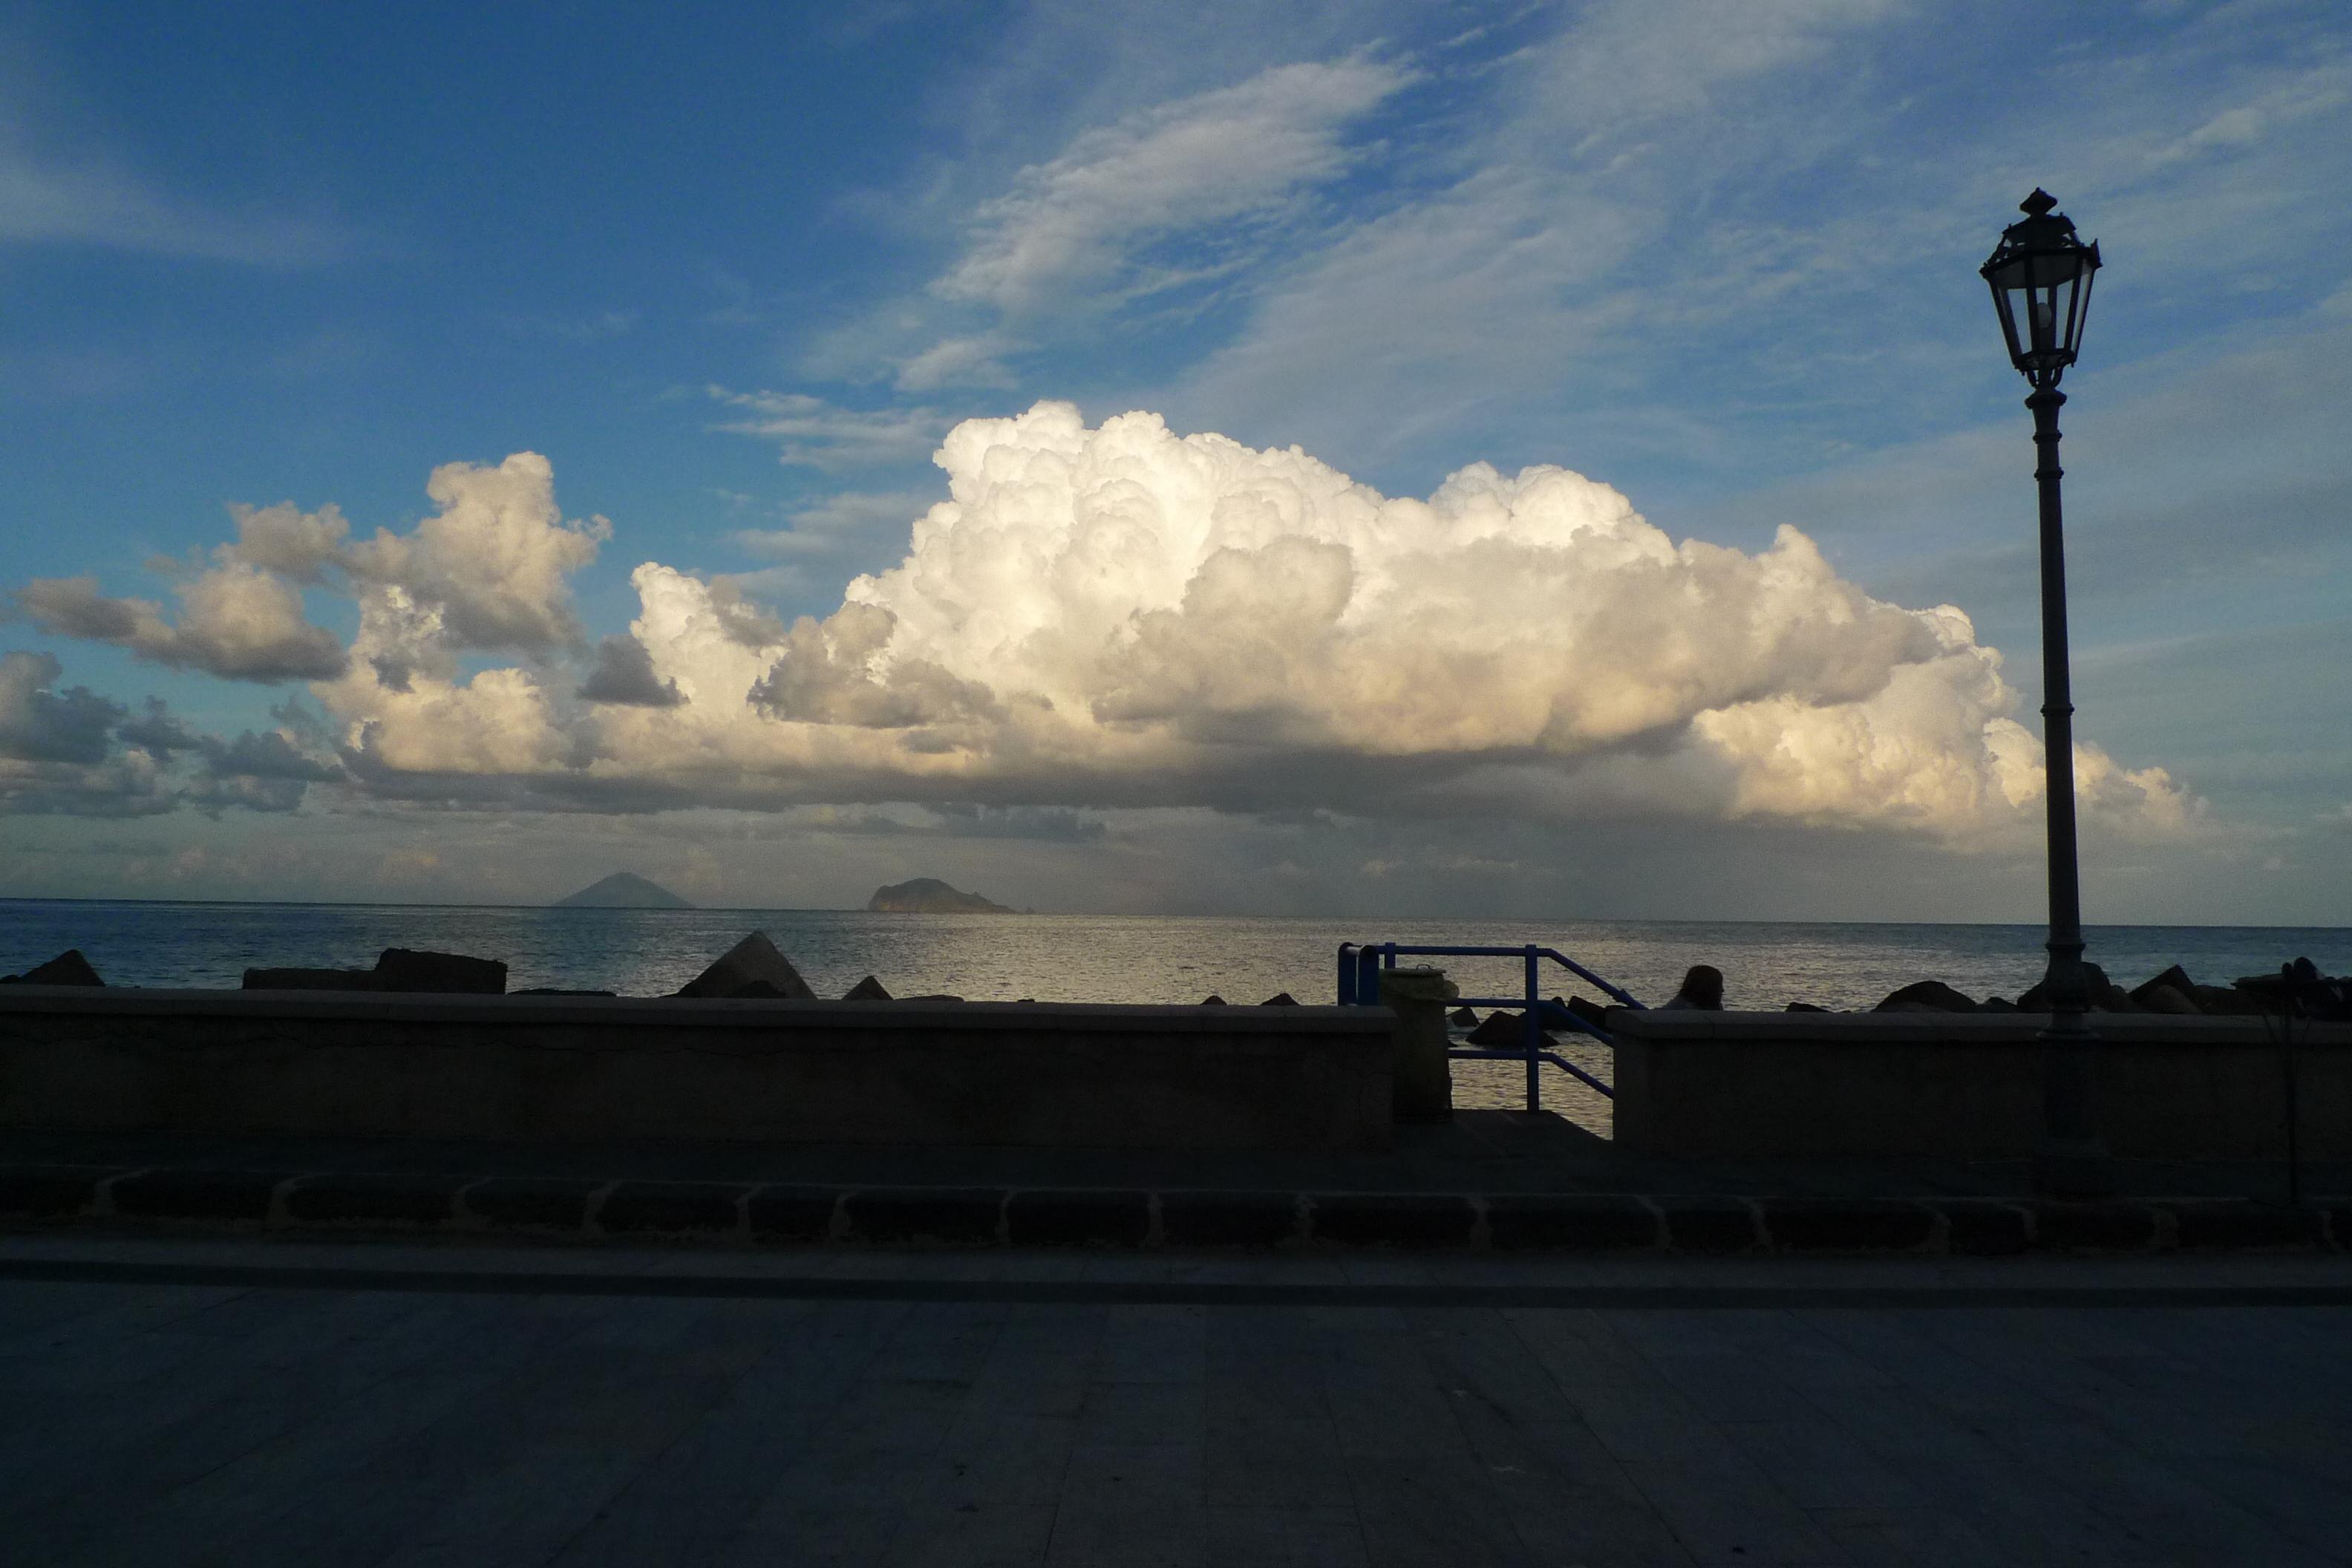 cloud atlas?